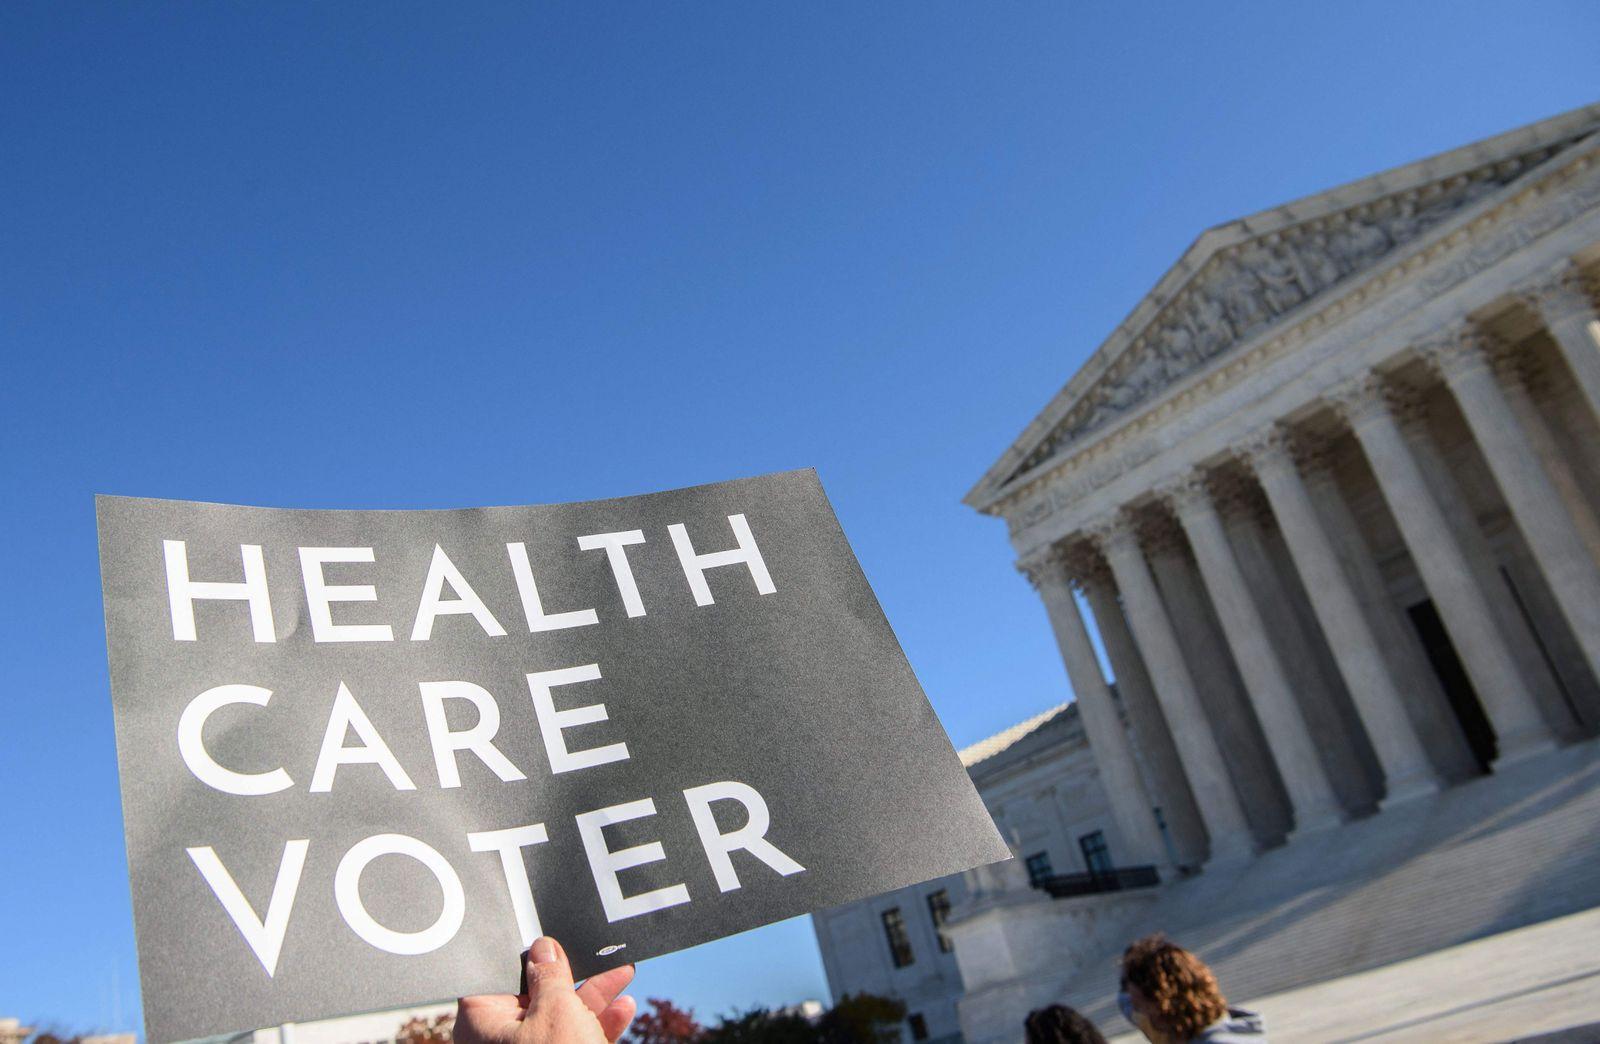 FILES-US-JUSTICE-HEALTH-OBAMACARE